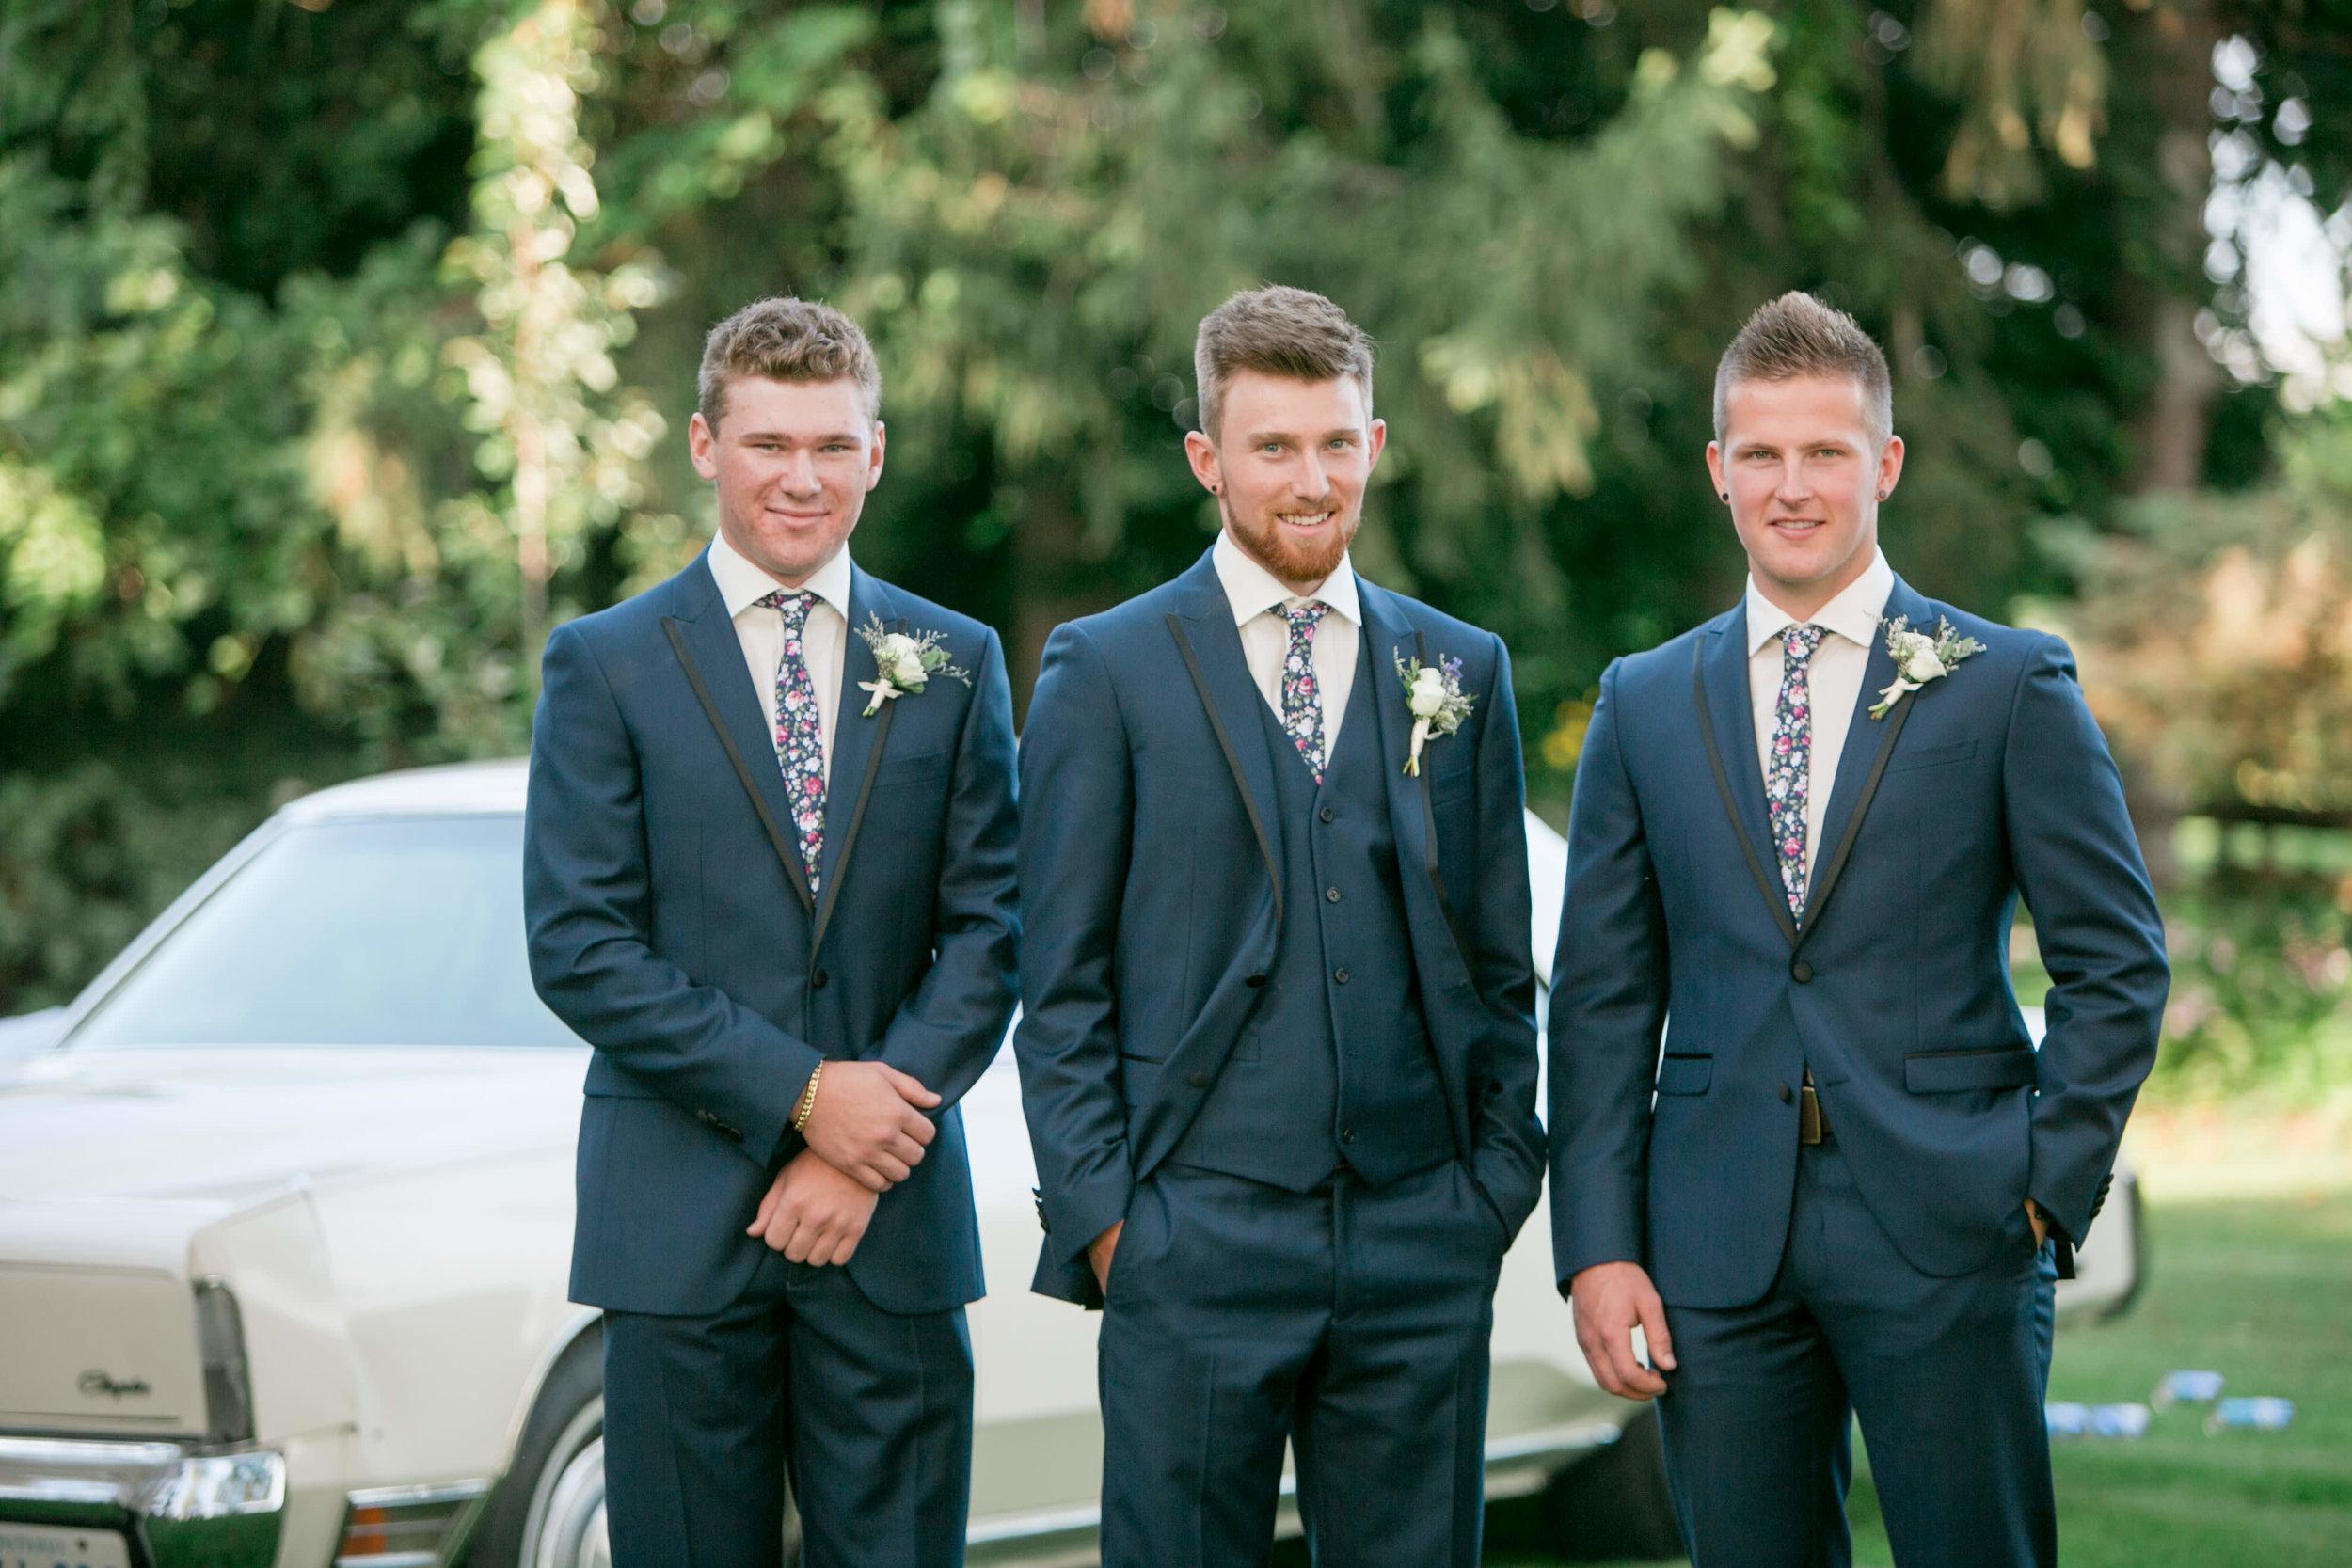 Maddy___Brandon___Daniel_Ricci_Weddings_High_Res._Finals_396.jpg